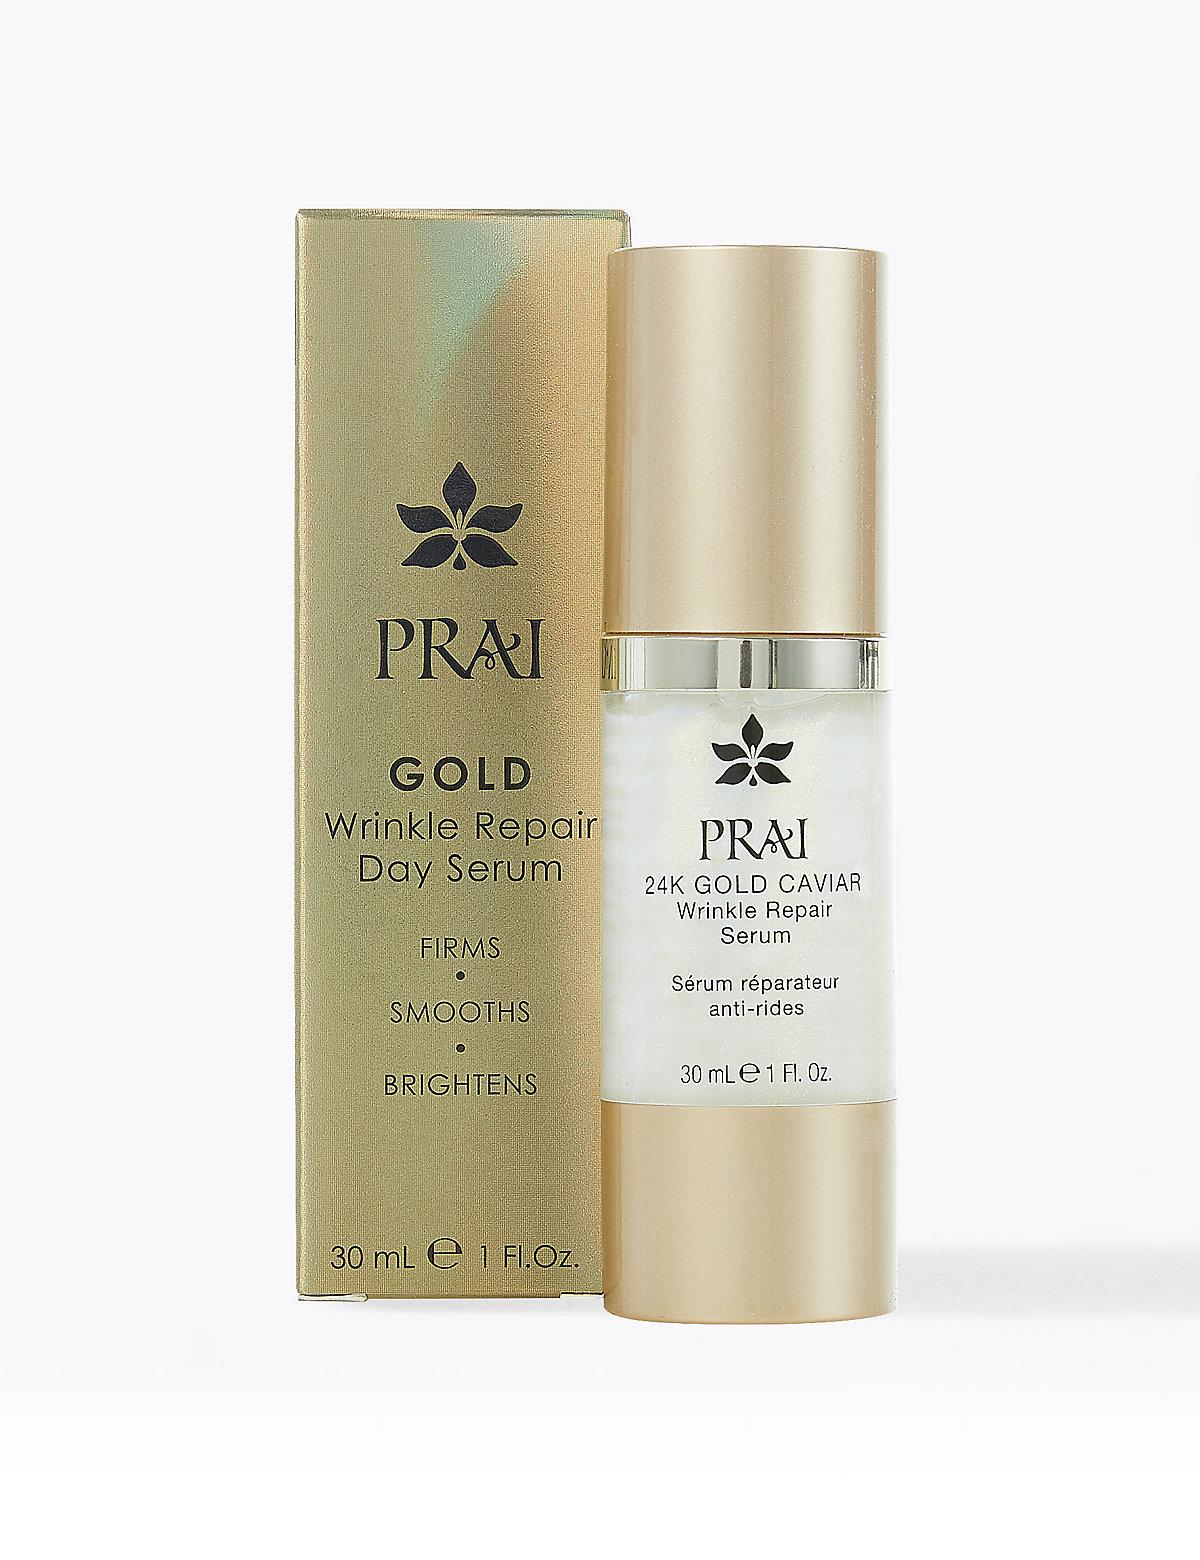 PRAI 24k Gold Wrinkle Repair Serum 30ml